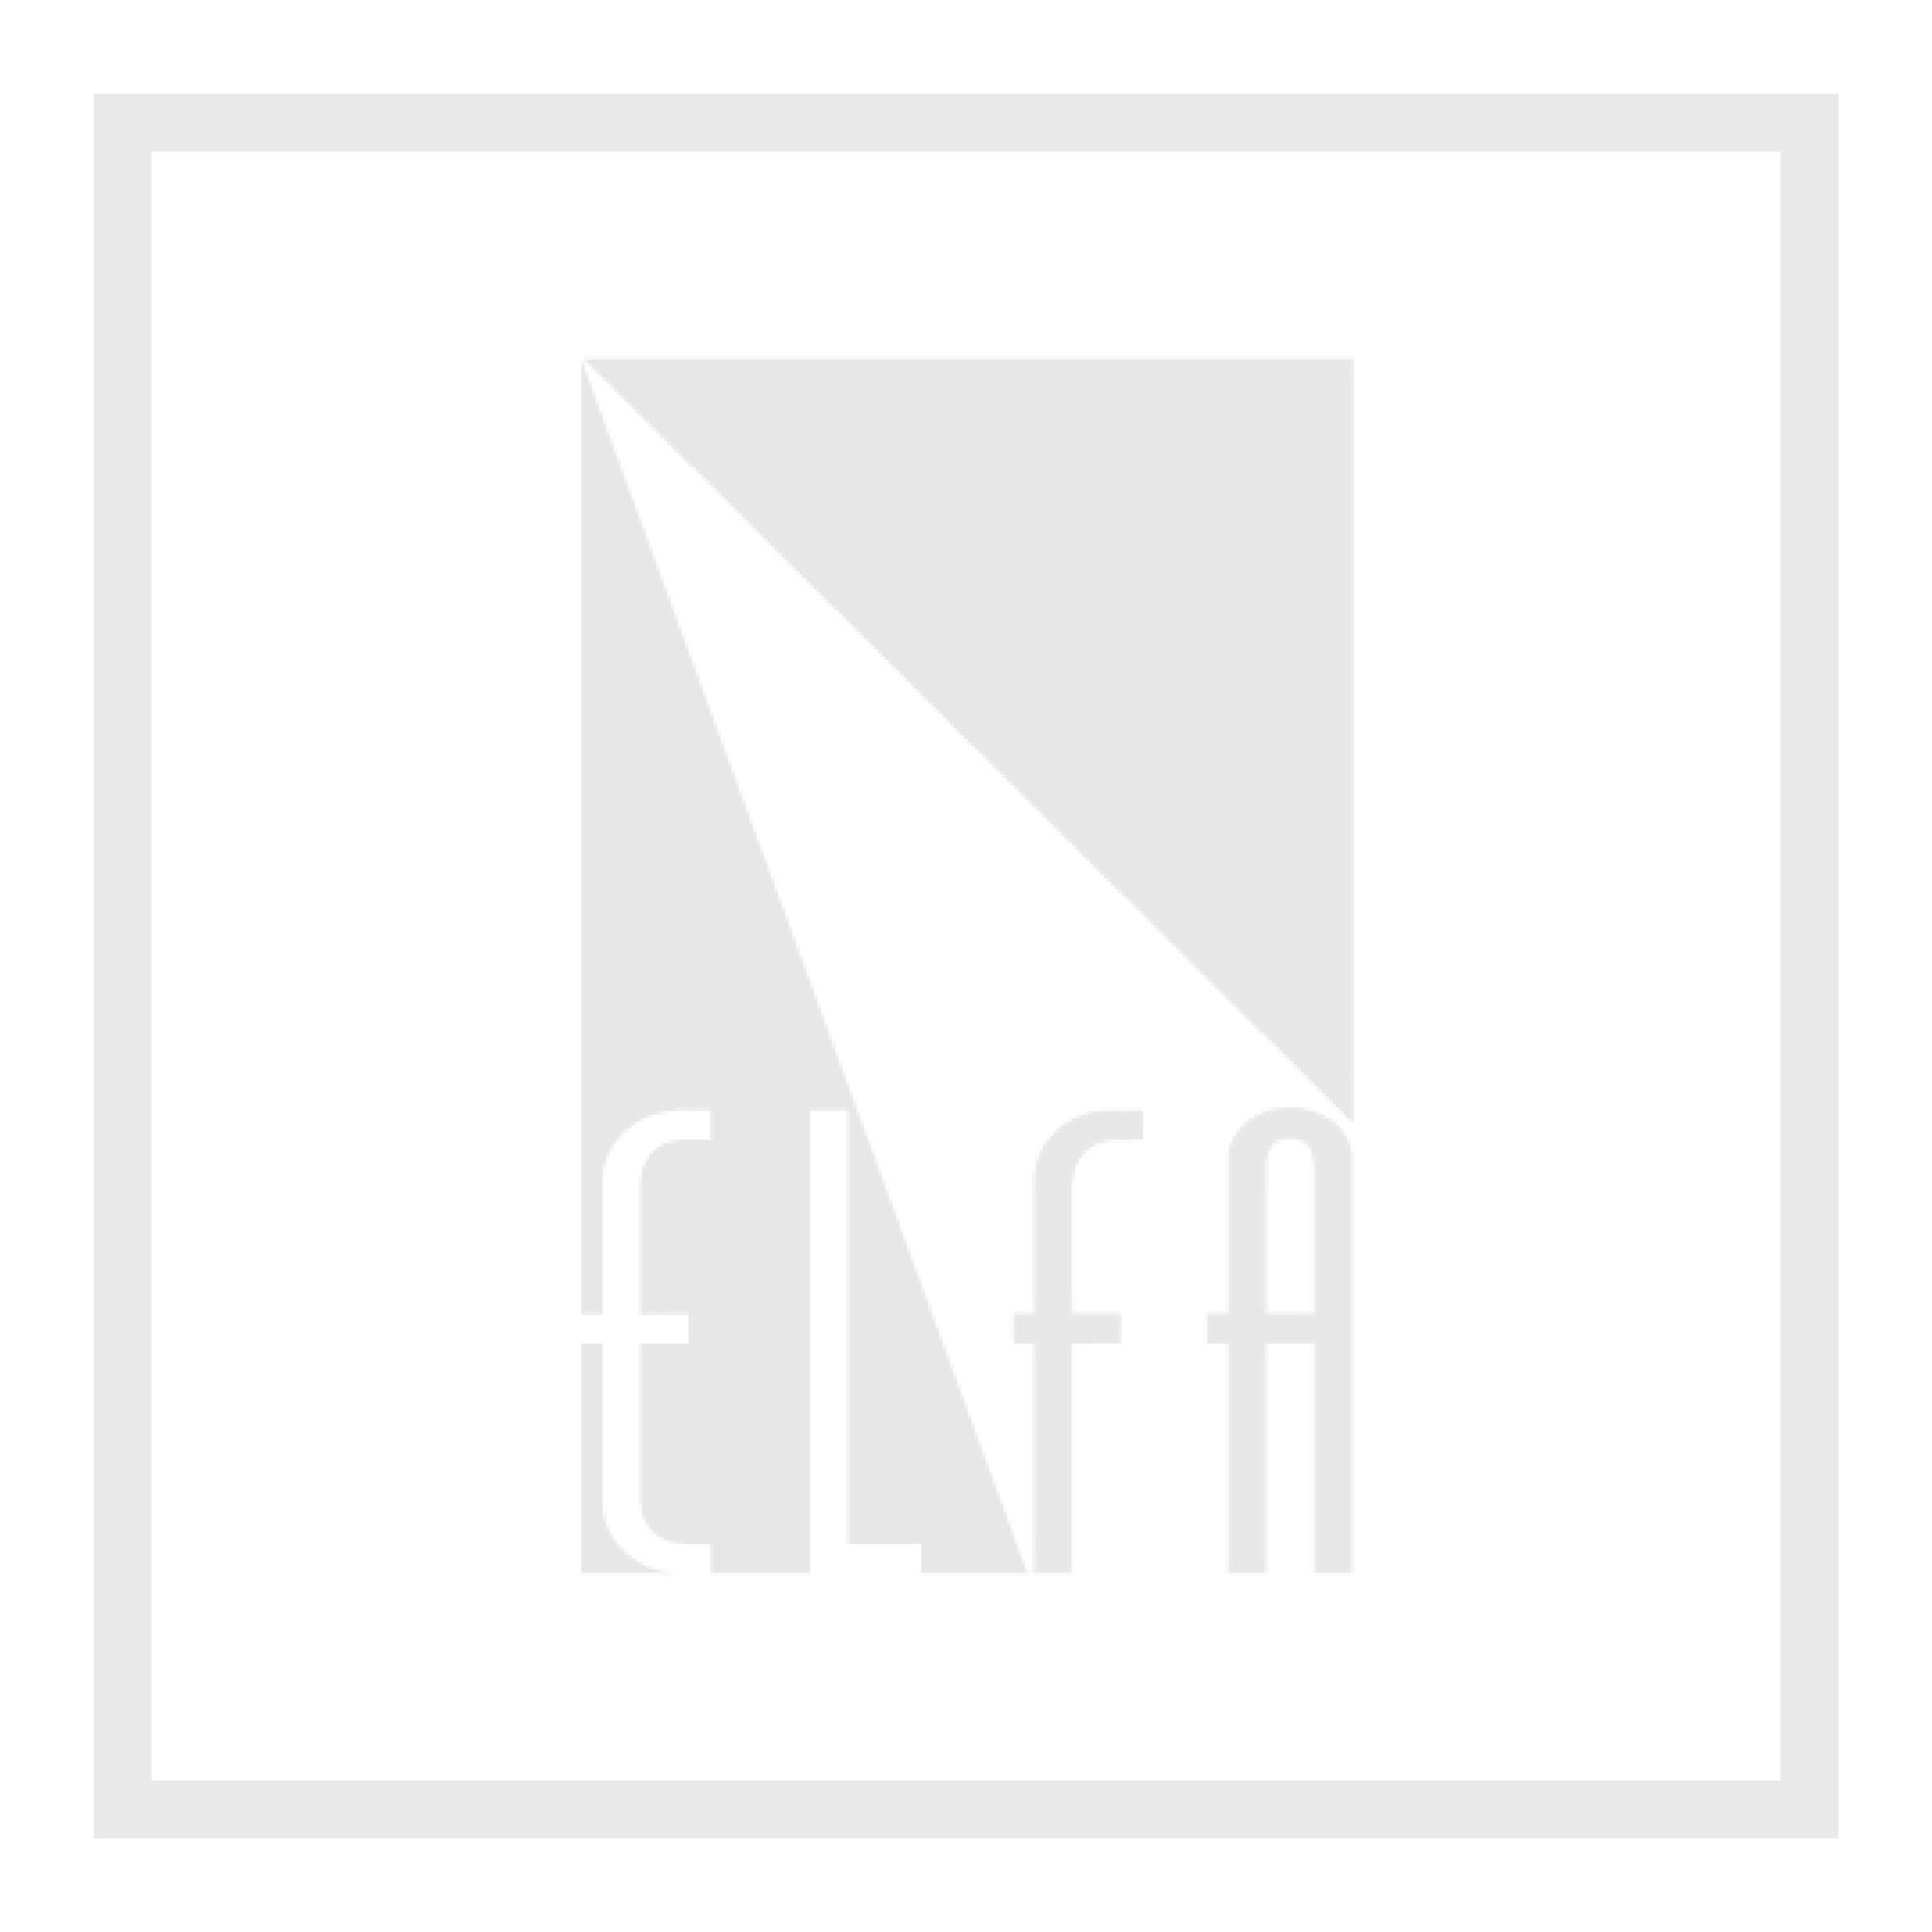 Nissen Kabel LN111790/1/2